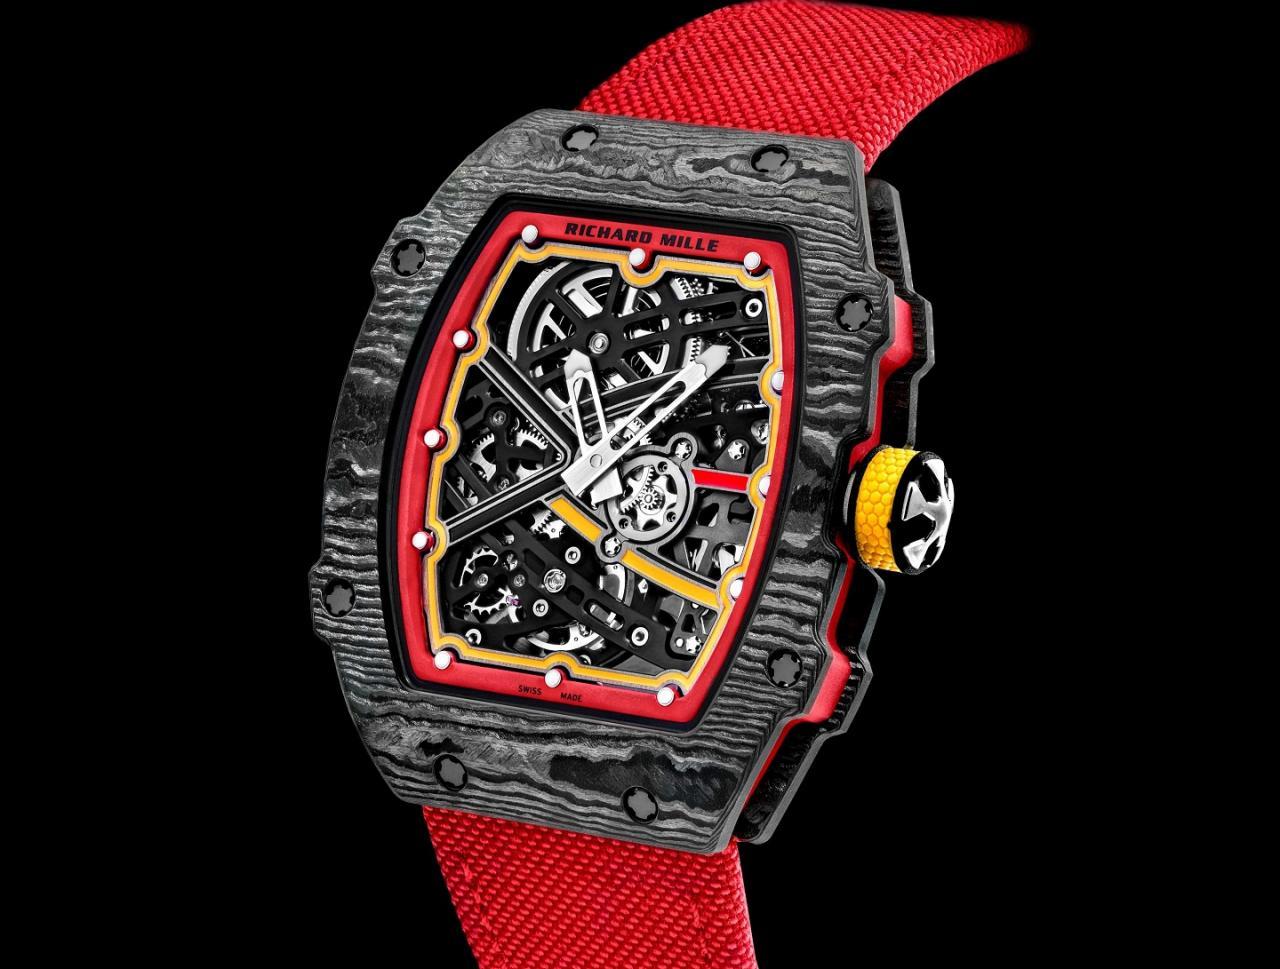 Richard Mille RM 67-02 Alexander Zverev Edition Watch Watch Releases